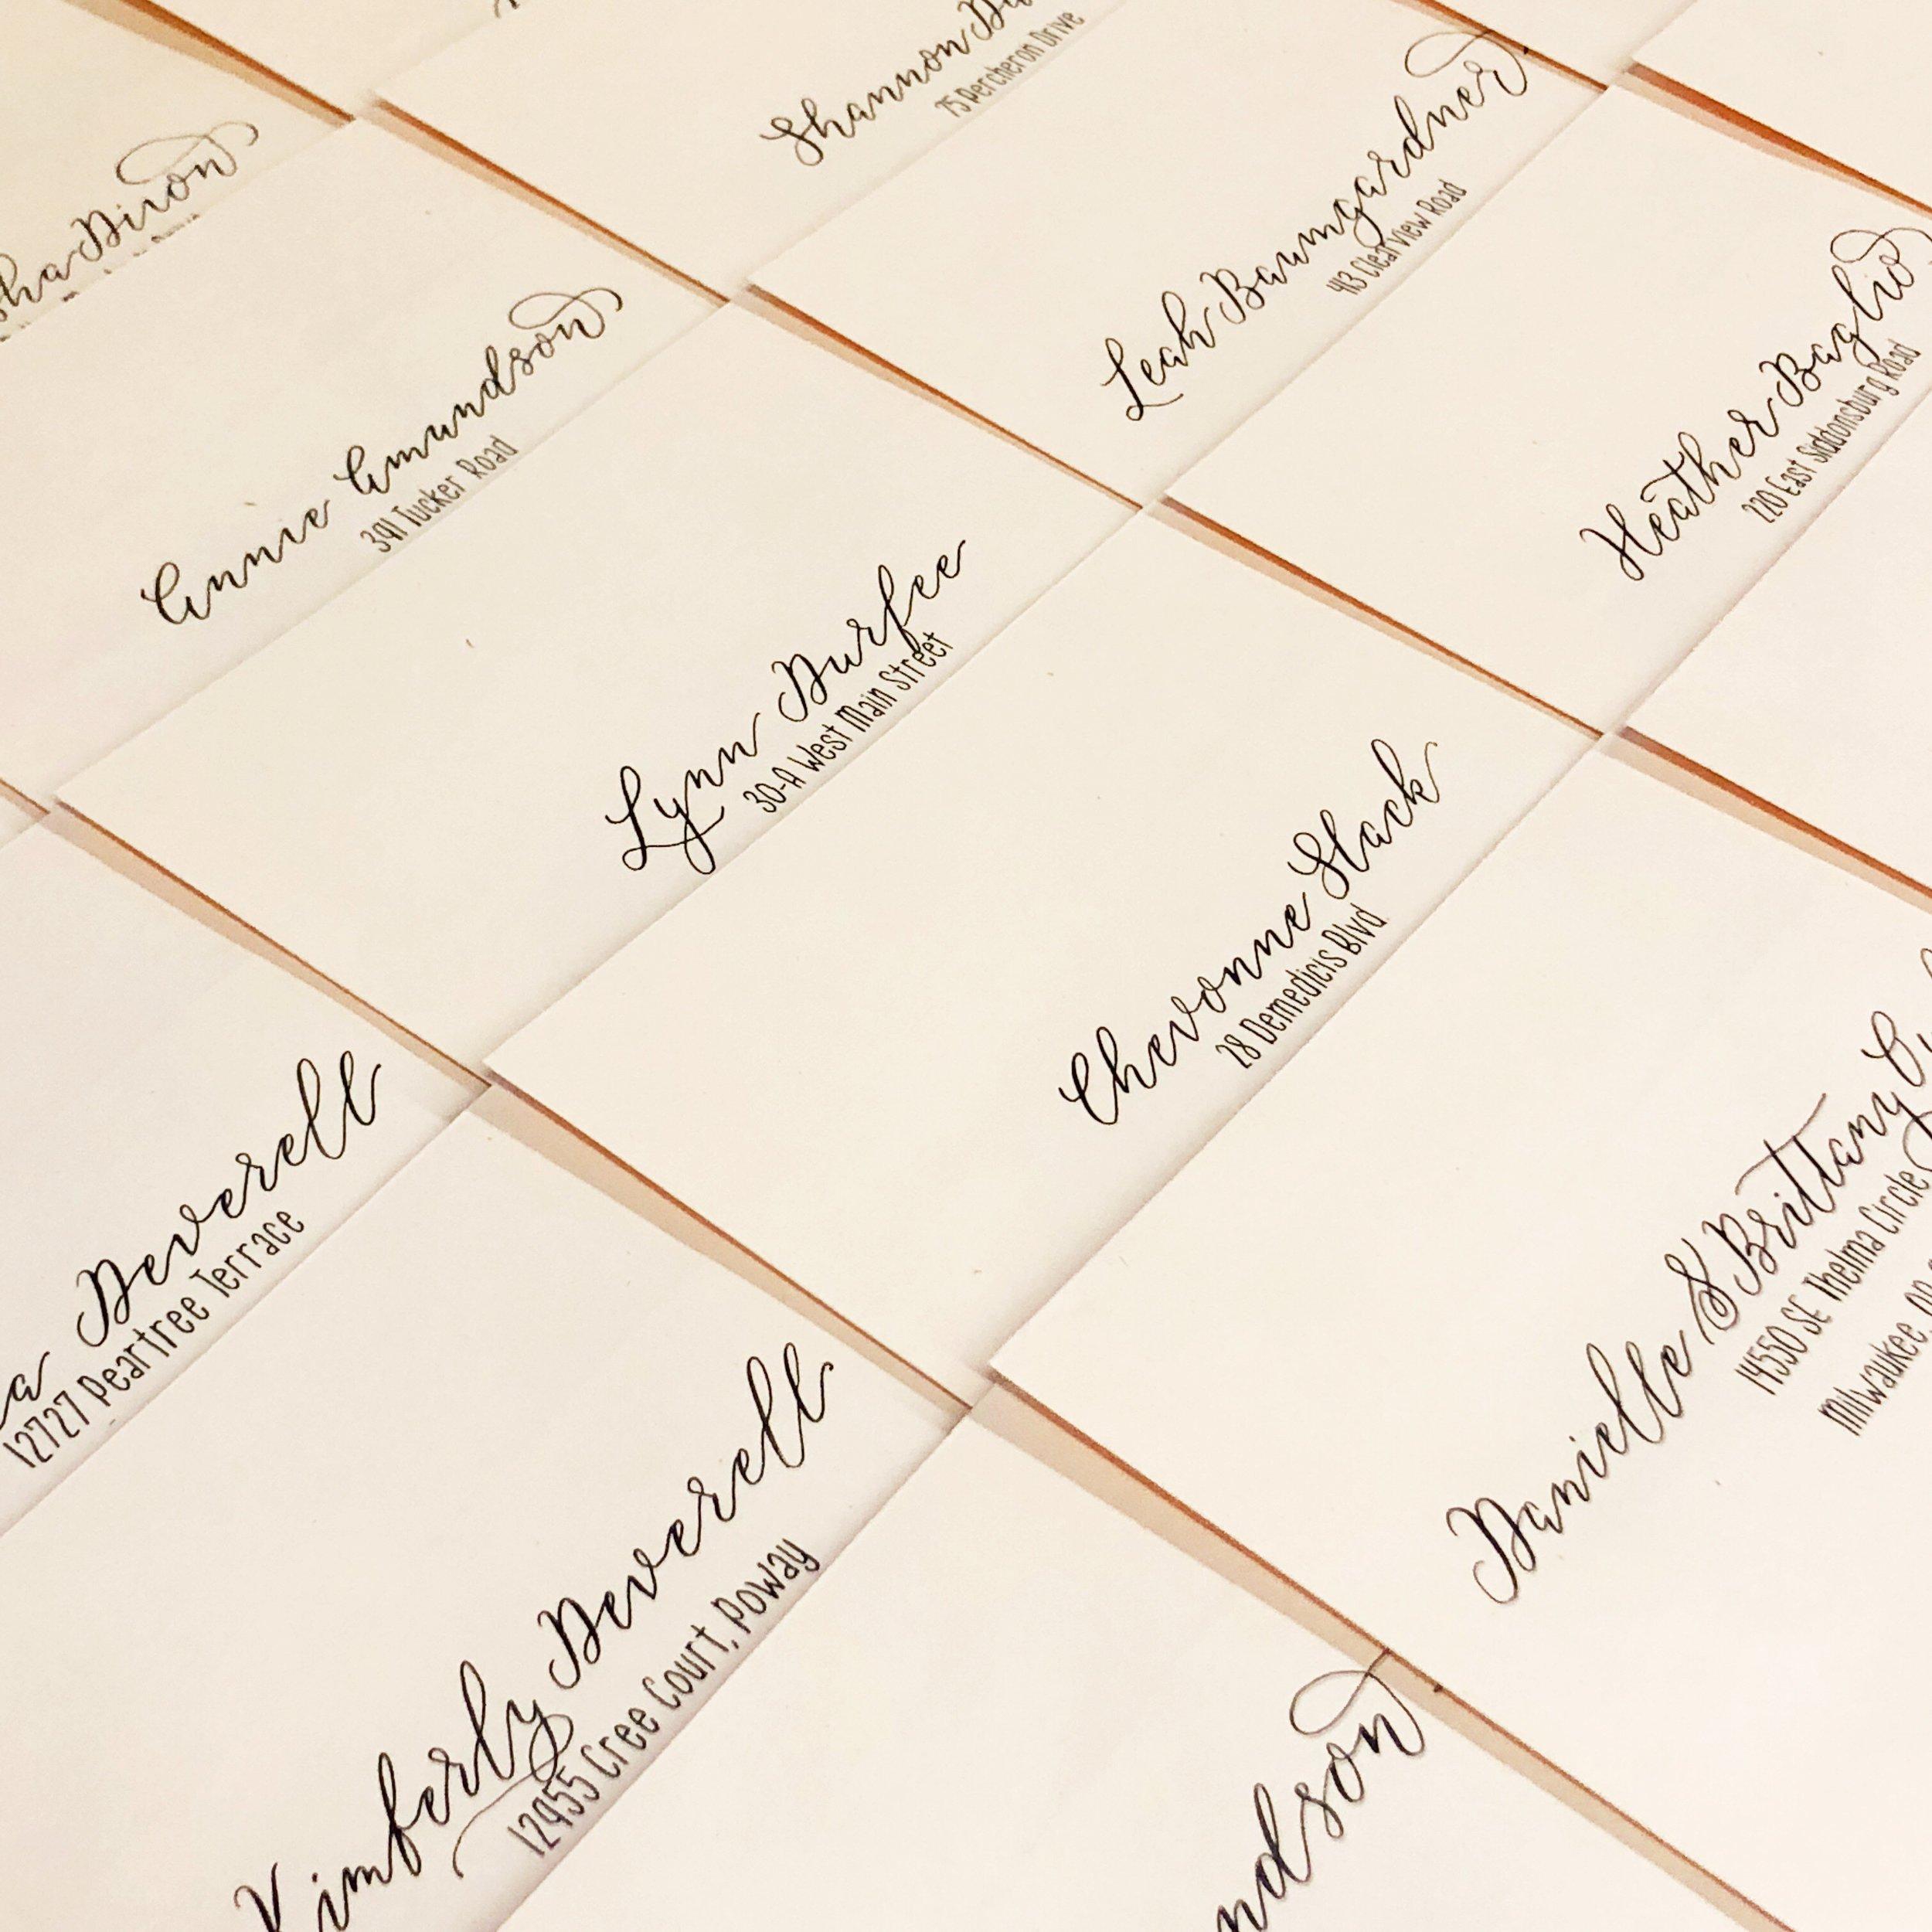 Central PA, York PA, JesSmith Designs, custom, wedding, invitations, bridal, announcements, save the date, baby, hanover, calligraphy, baltimore, wedding invitations, lancaster, gettysburg-03-18 16.31.31.jpg